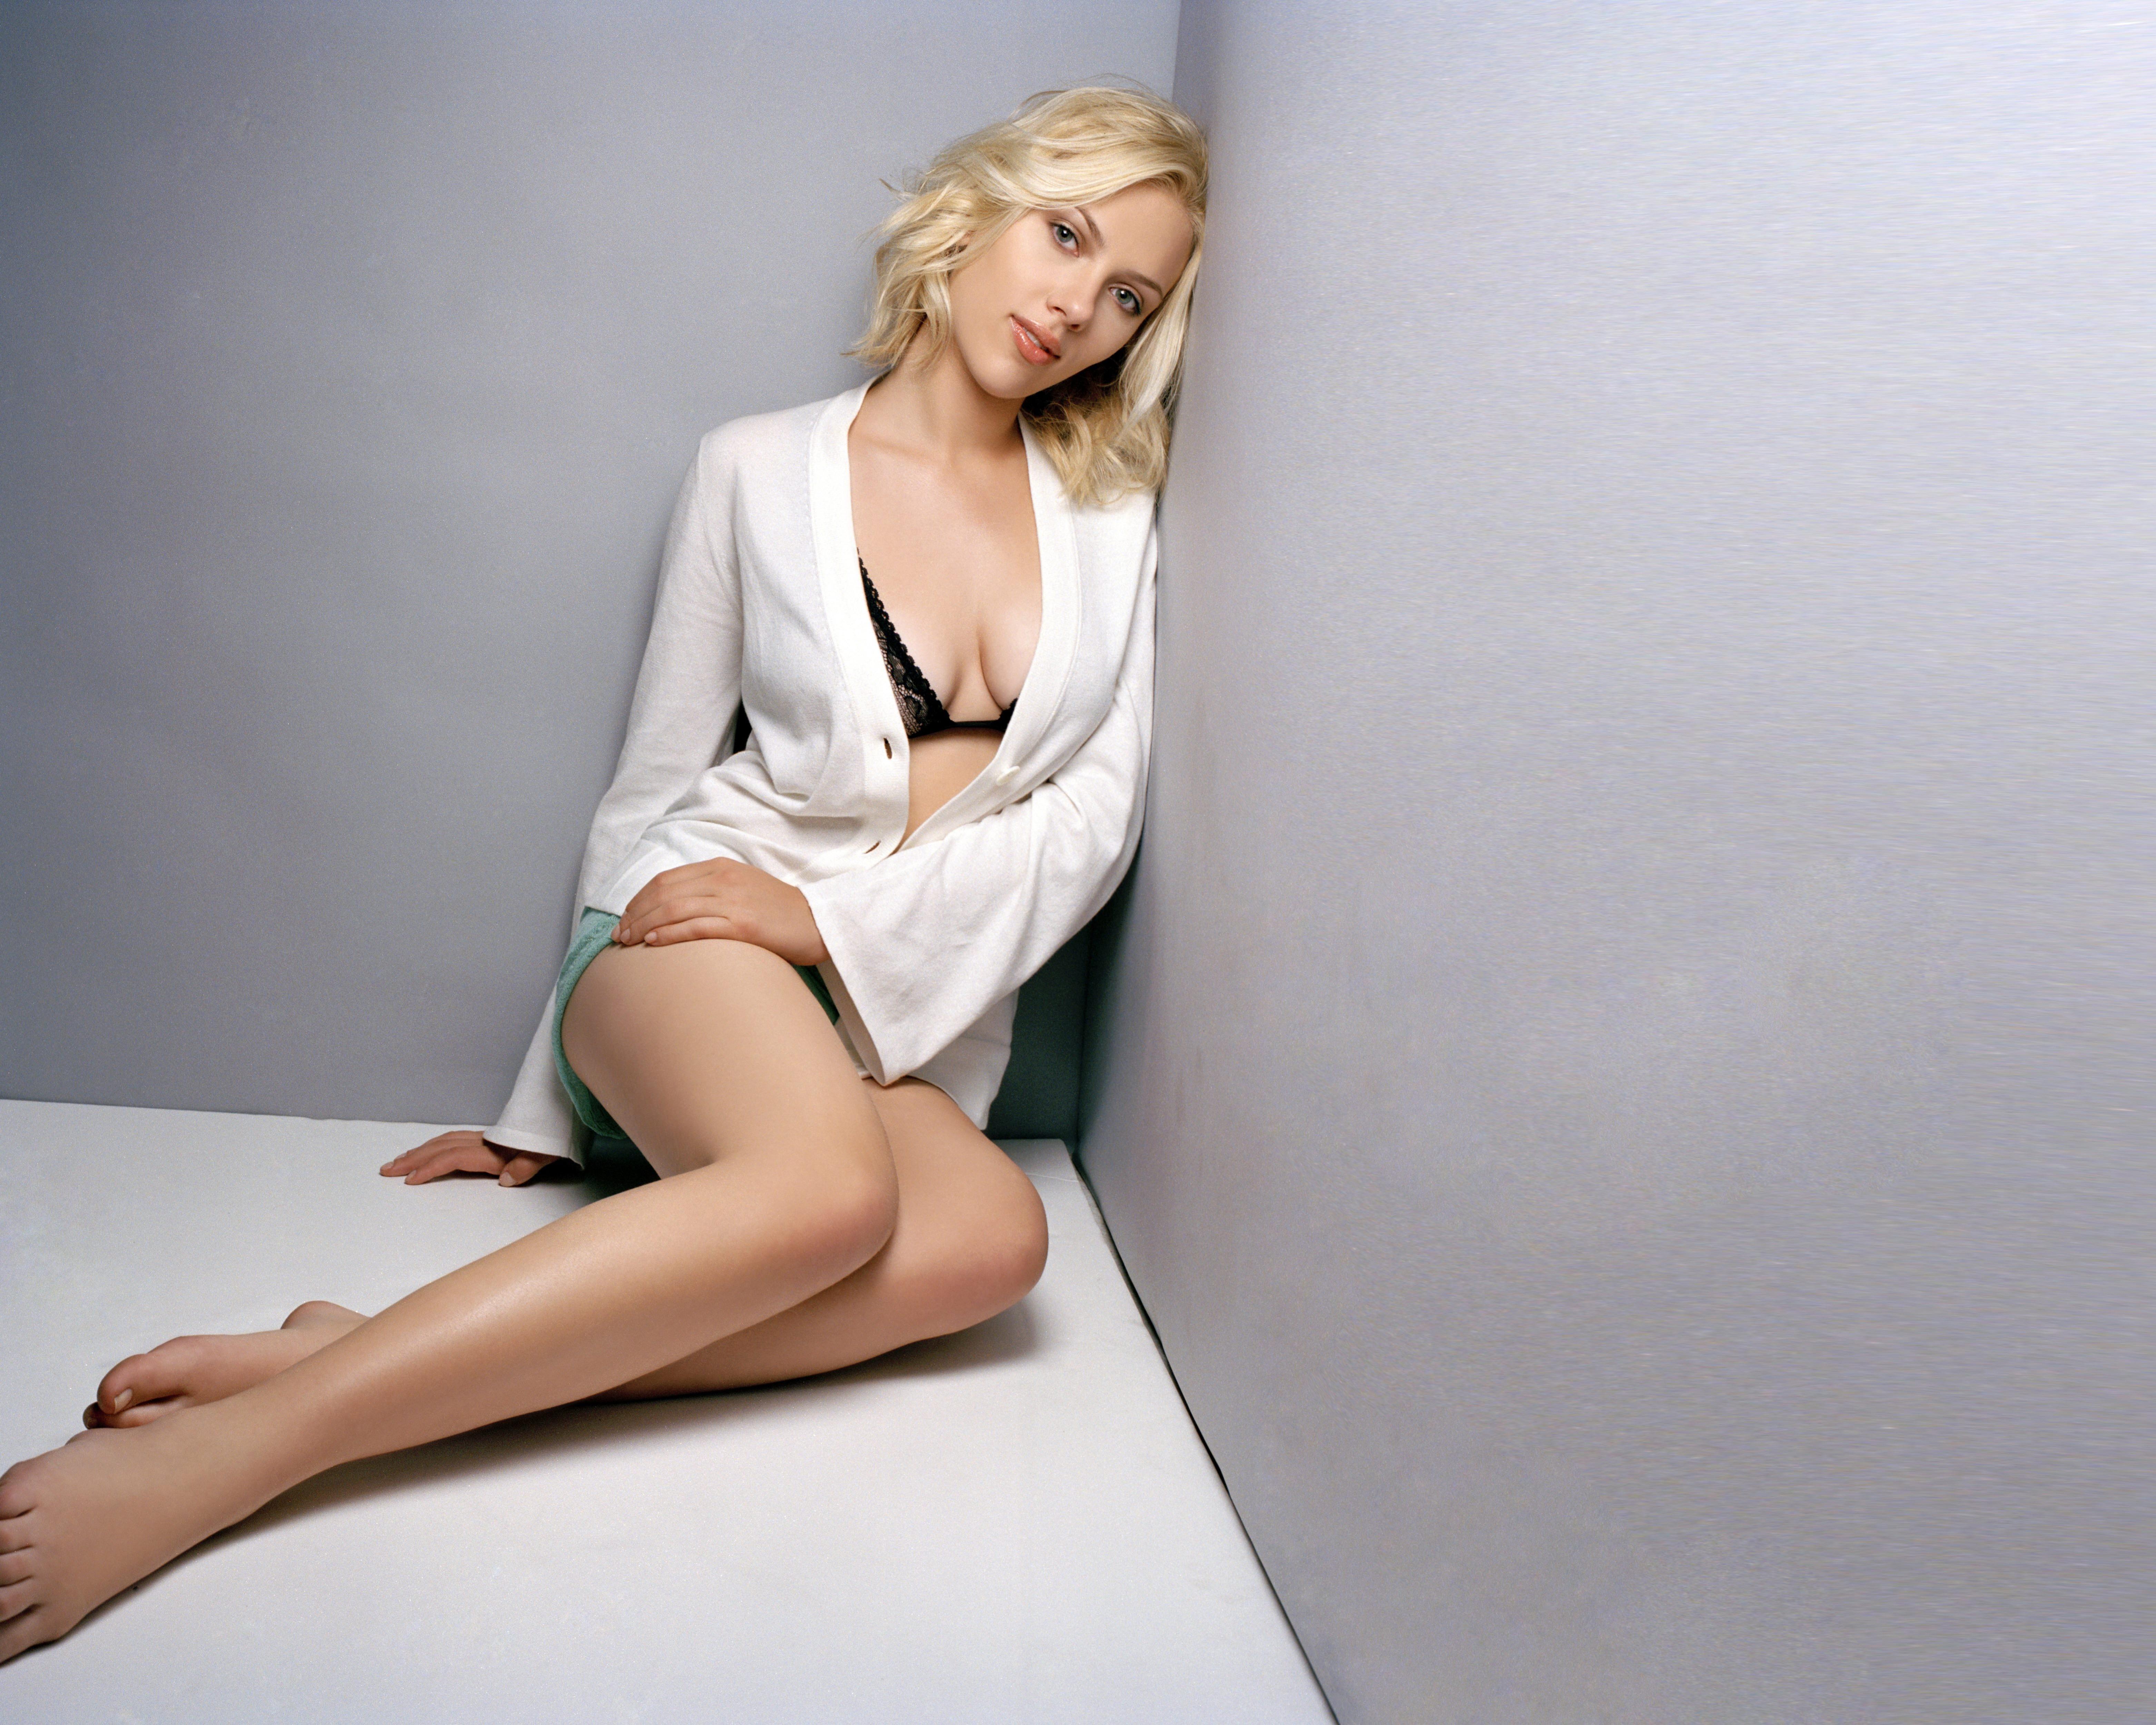 People 6250x5000 Scarlett Johansson actress women legs shorts open shirt black bras looking at viewer